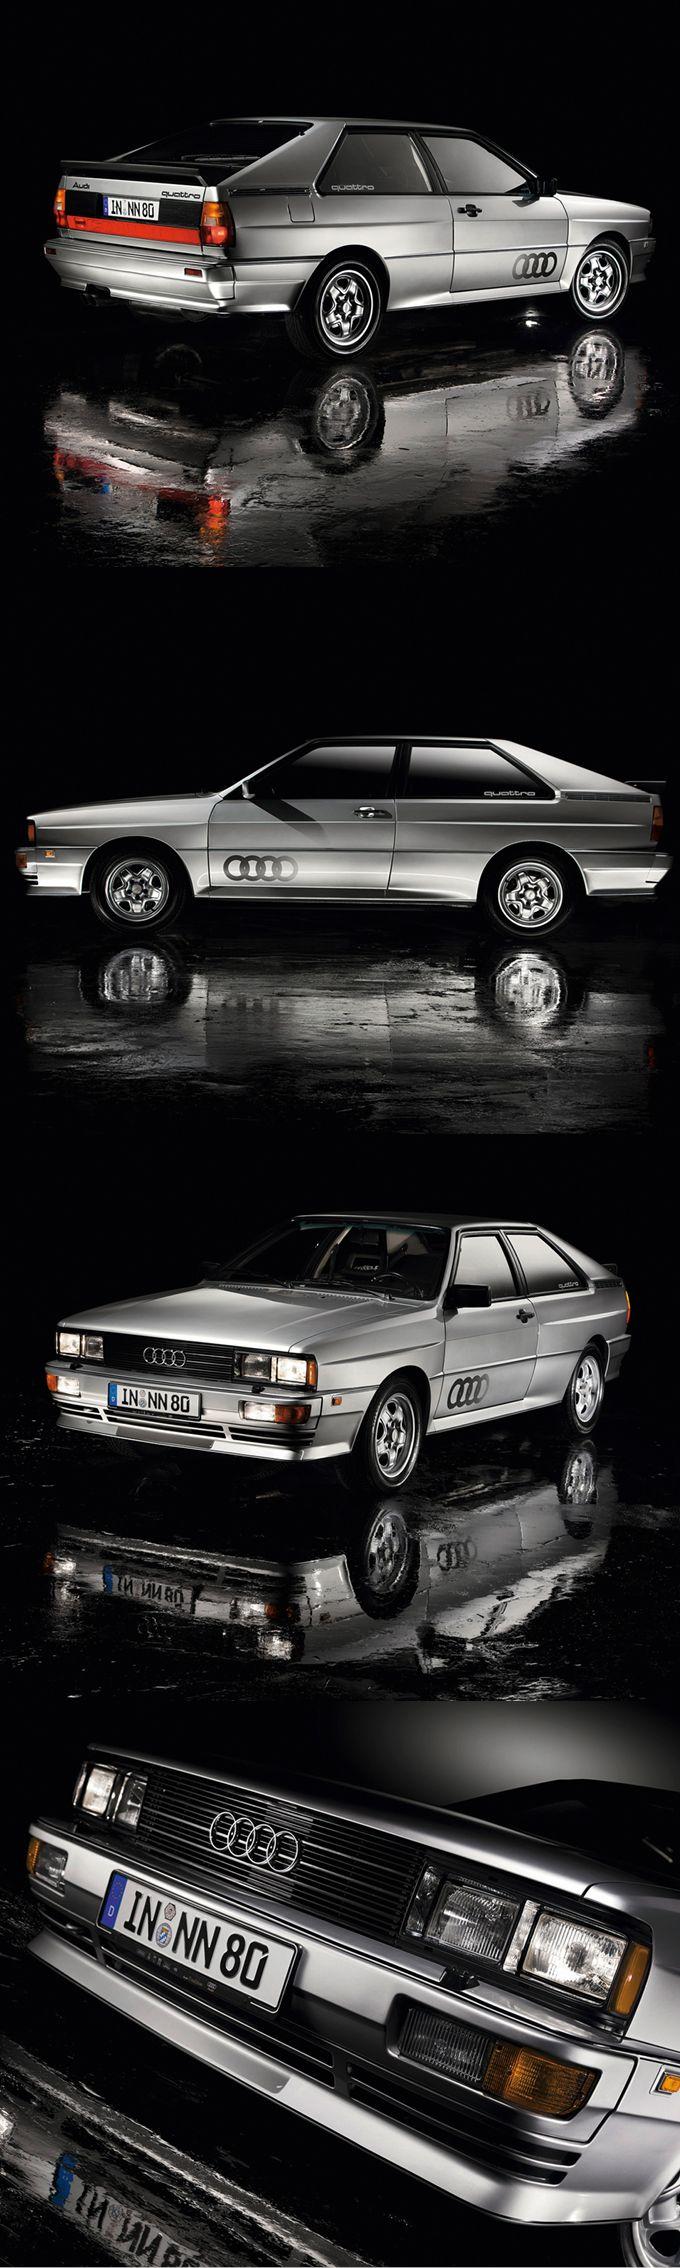 1980 Audi Quattro / 197hp 2.1l L5 / silver / Germany / Ur-Quattro / photography: Pedro Mota / 17-312